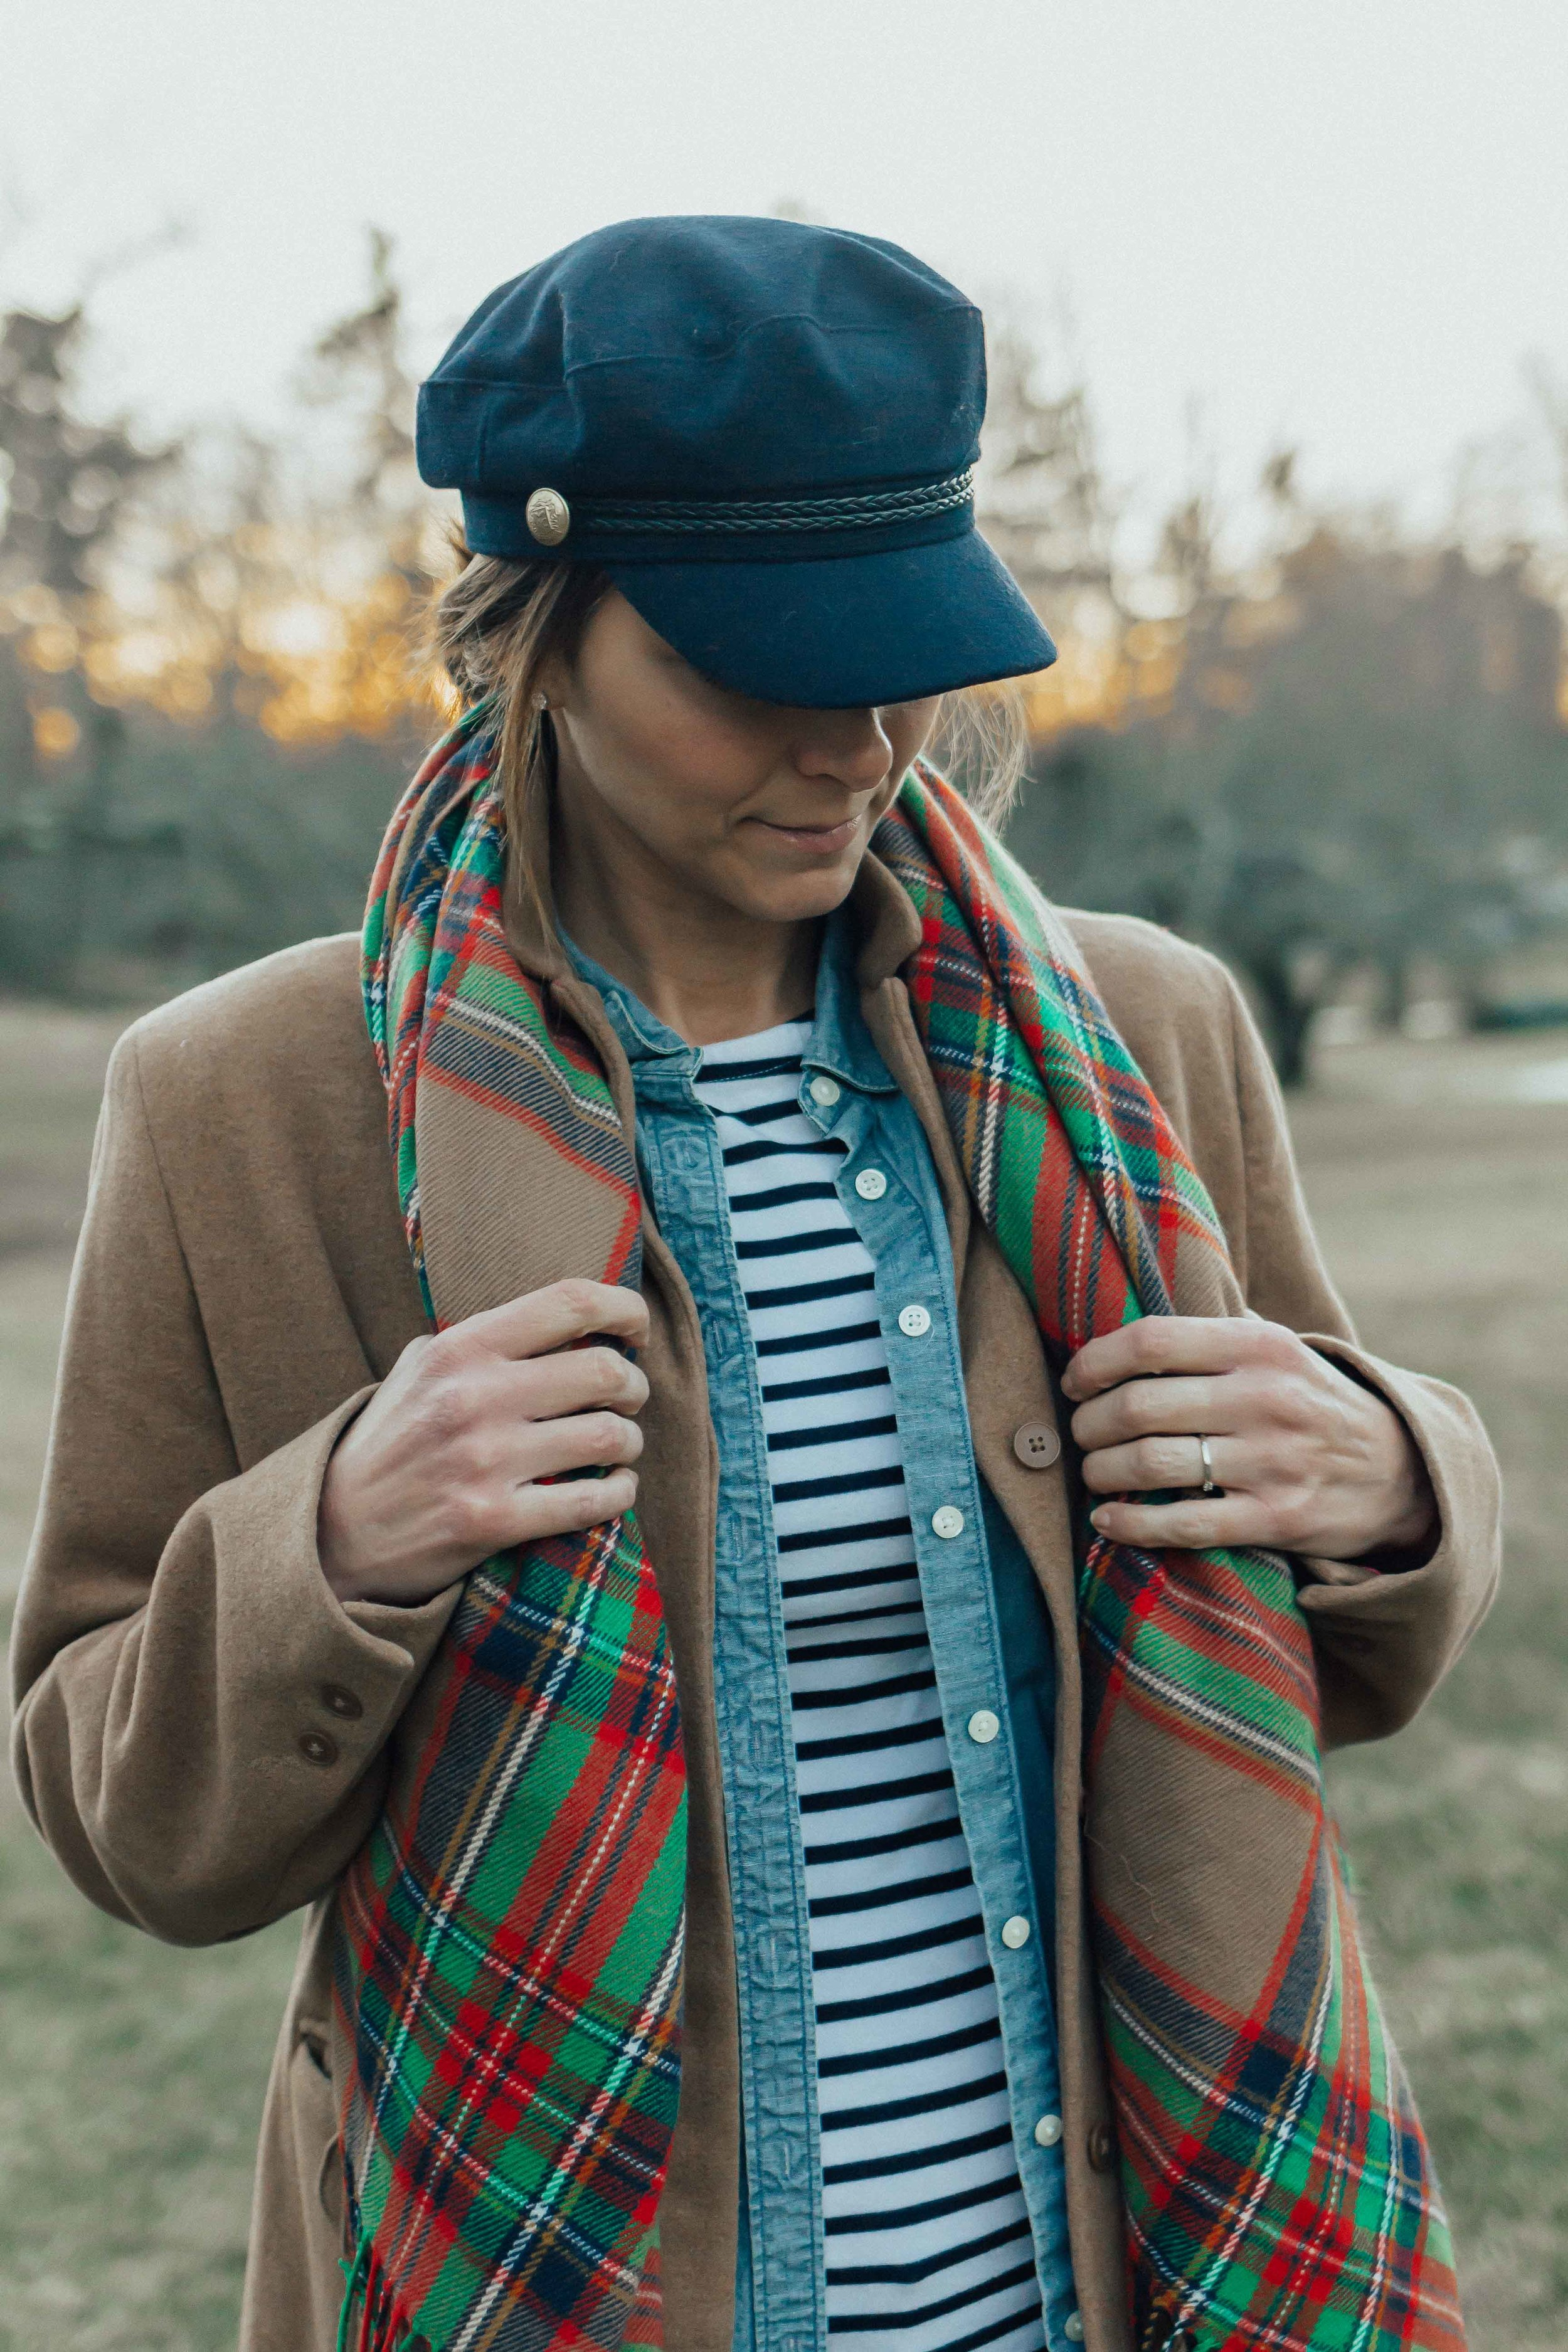 What I'm Wearing - CHAMBRAY BUTTON-UPBLANKET SCARFCAPTAINS CAP (similar)STRIPED TEEDENIMCAMEL COAT (similar)WOOL SOCKSBEAN BOOTS